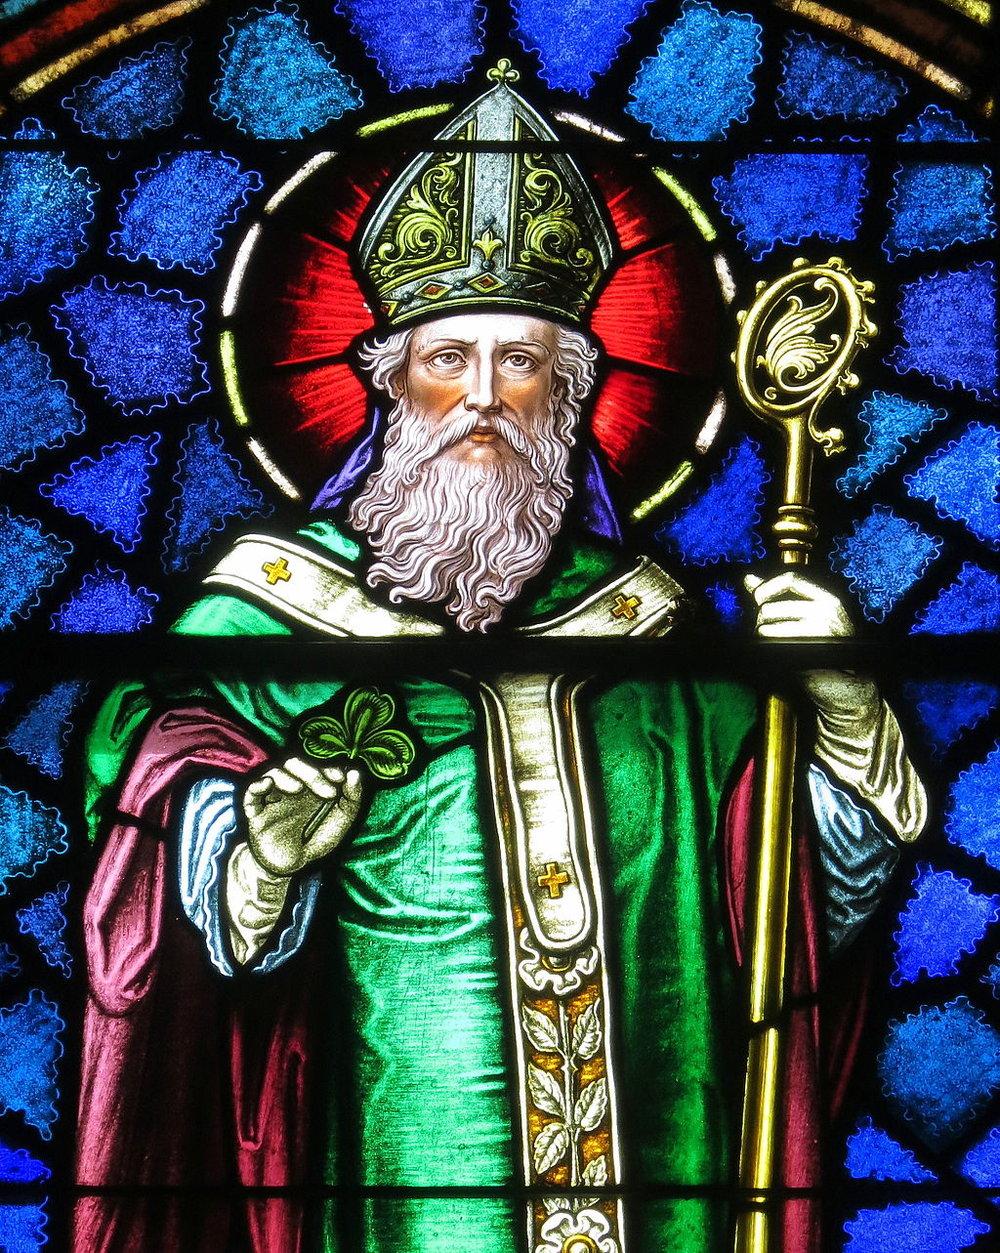 Saint_Patrick_Catholic_Church_(Junction_City,_Ohio)_-_stained_glass,_Saint_Patrick_-_detail.jpg